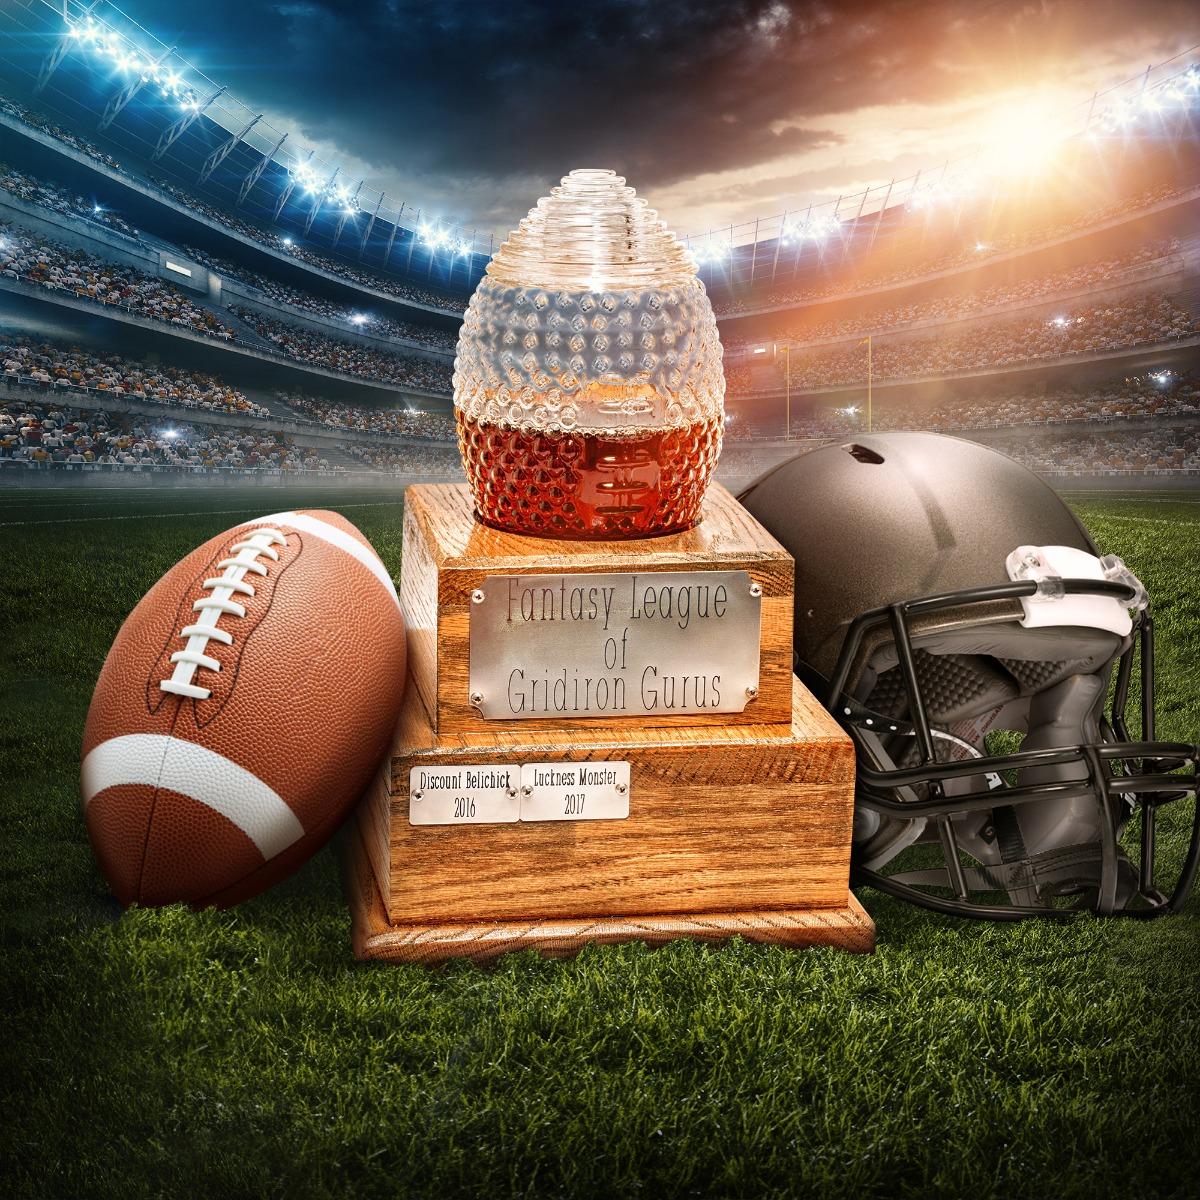 Beautiful Fantasy Football Trophy decanter